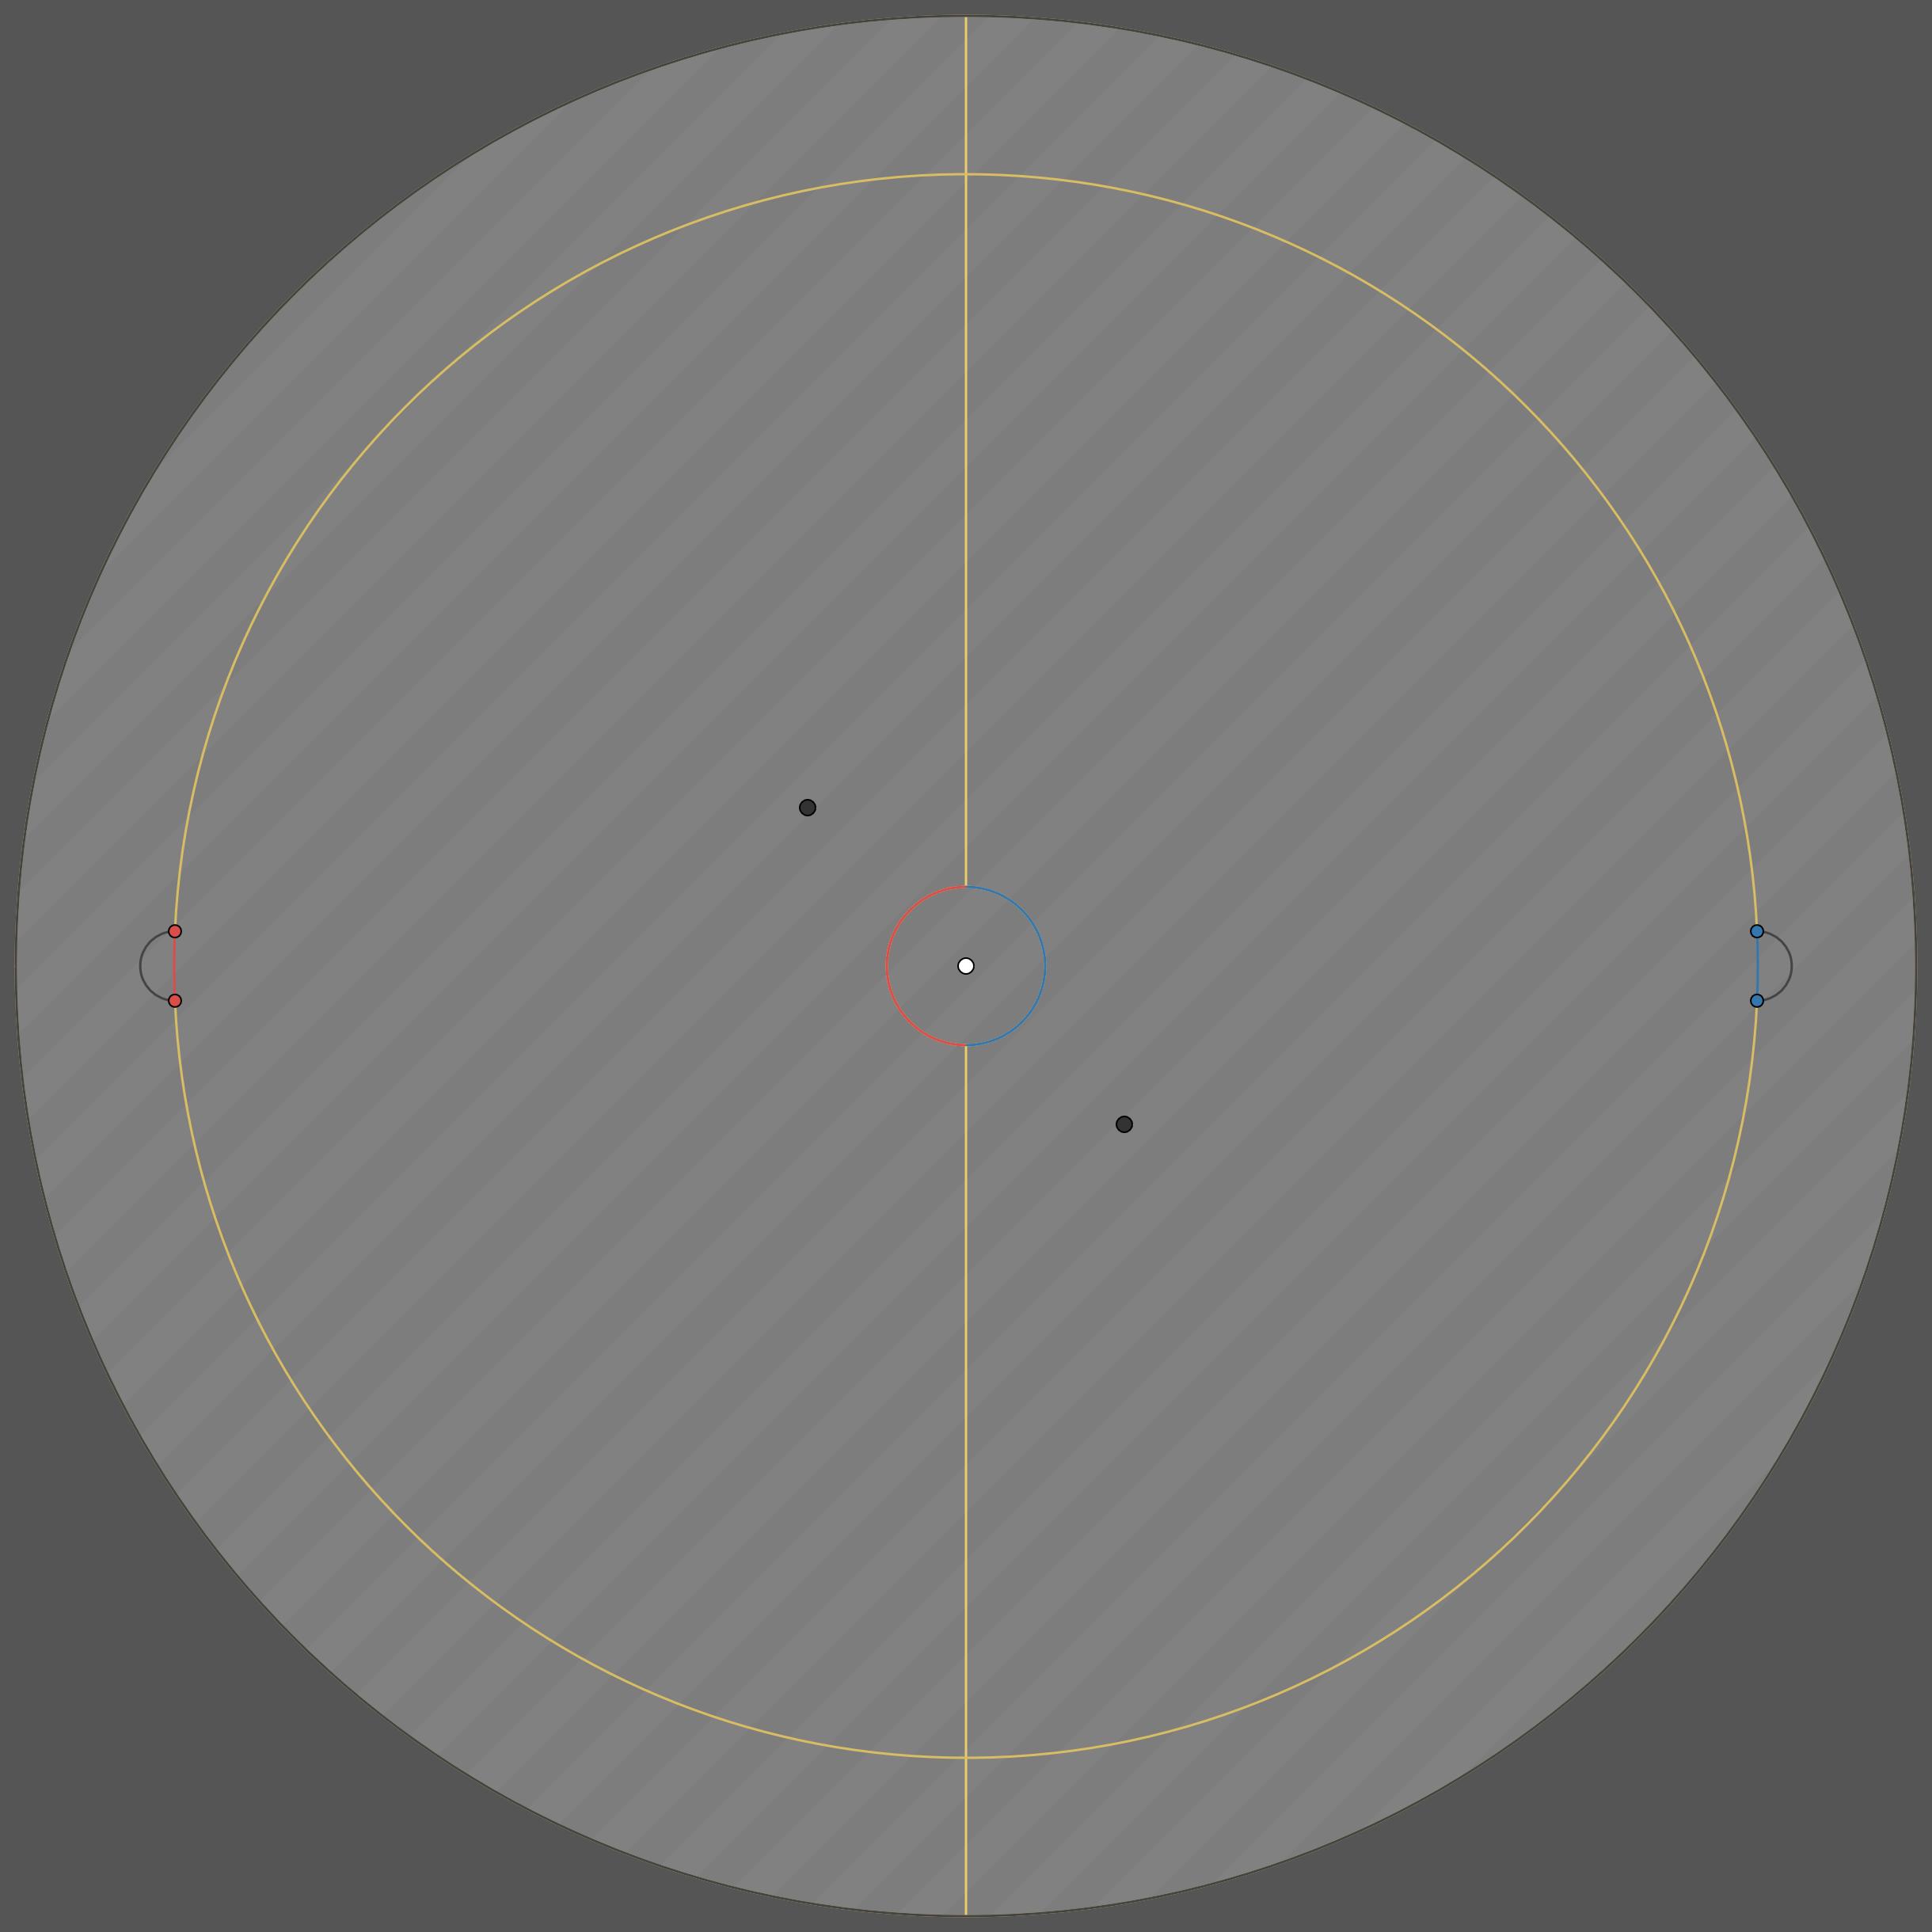 hax ball maps | UZY Circular Spacebounce Bludgers